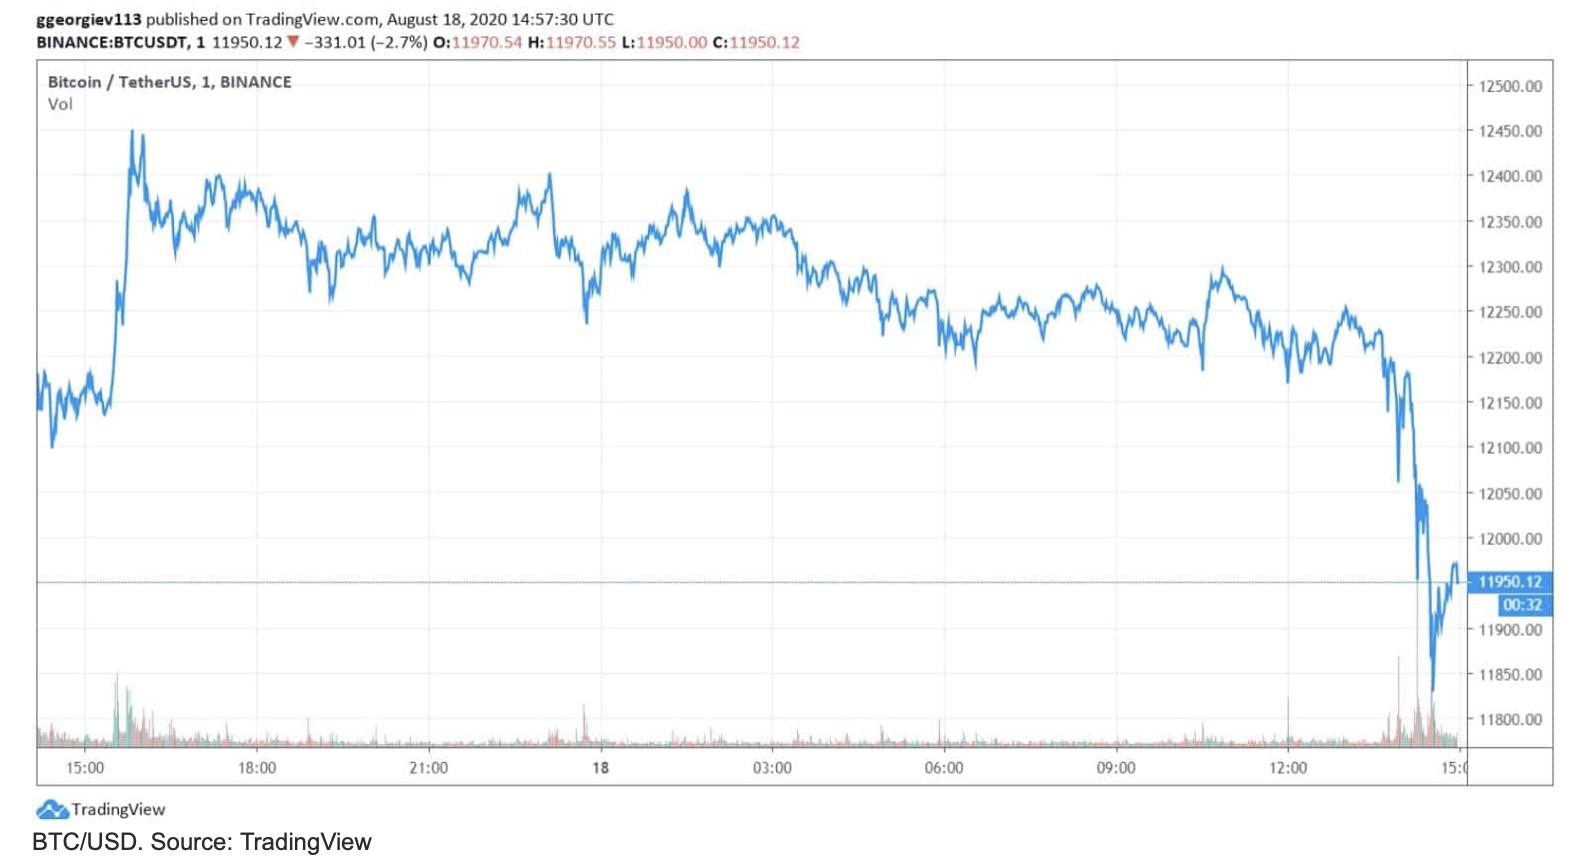 kripto para piyasasi kayip